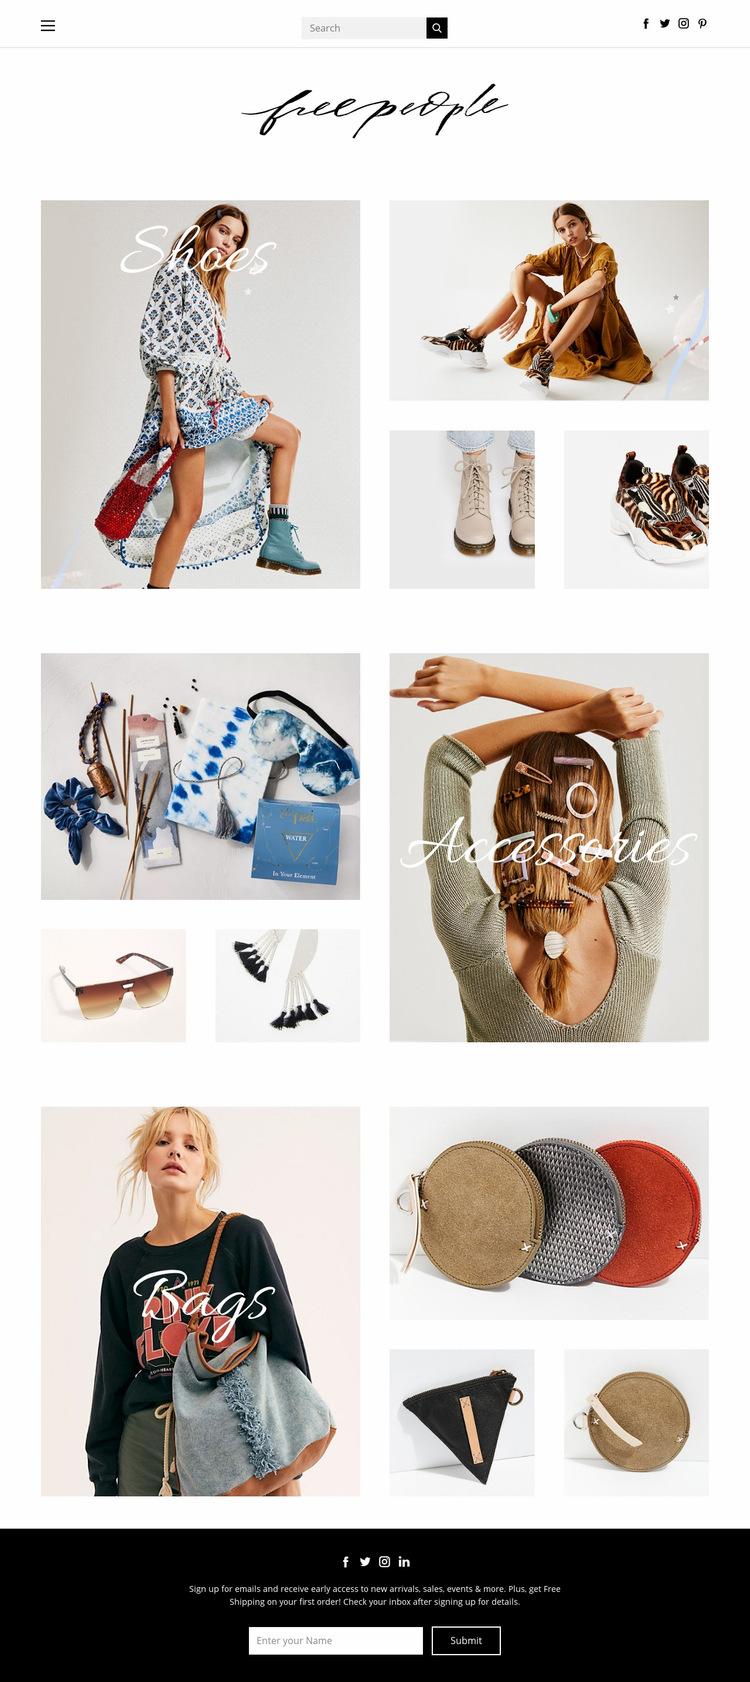 fashion Web Page Design